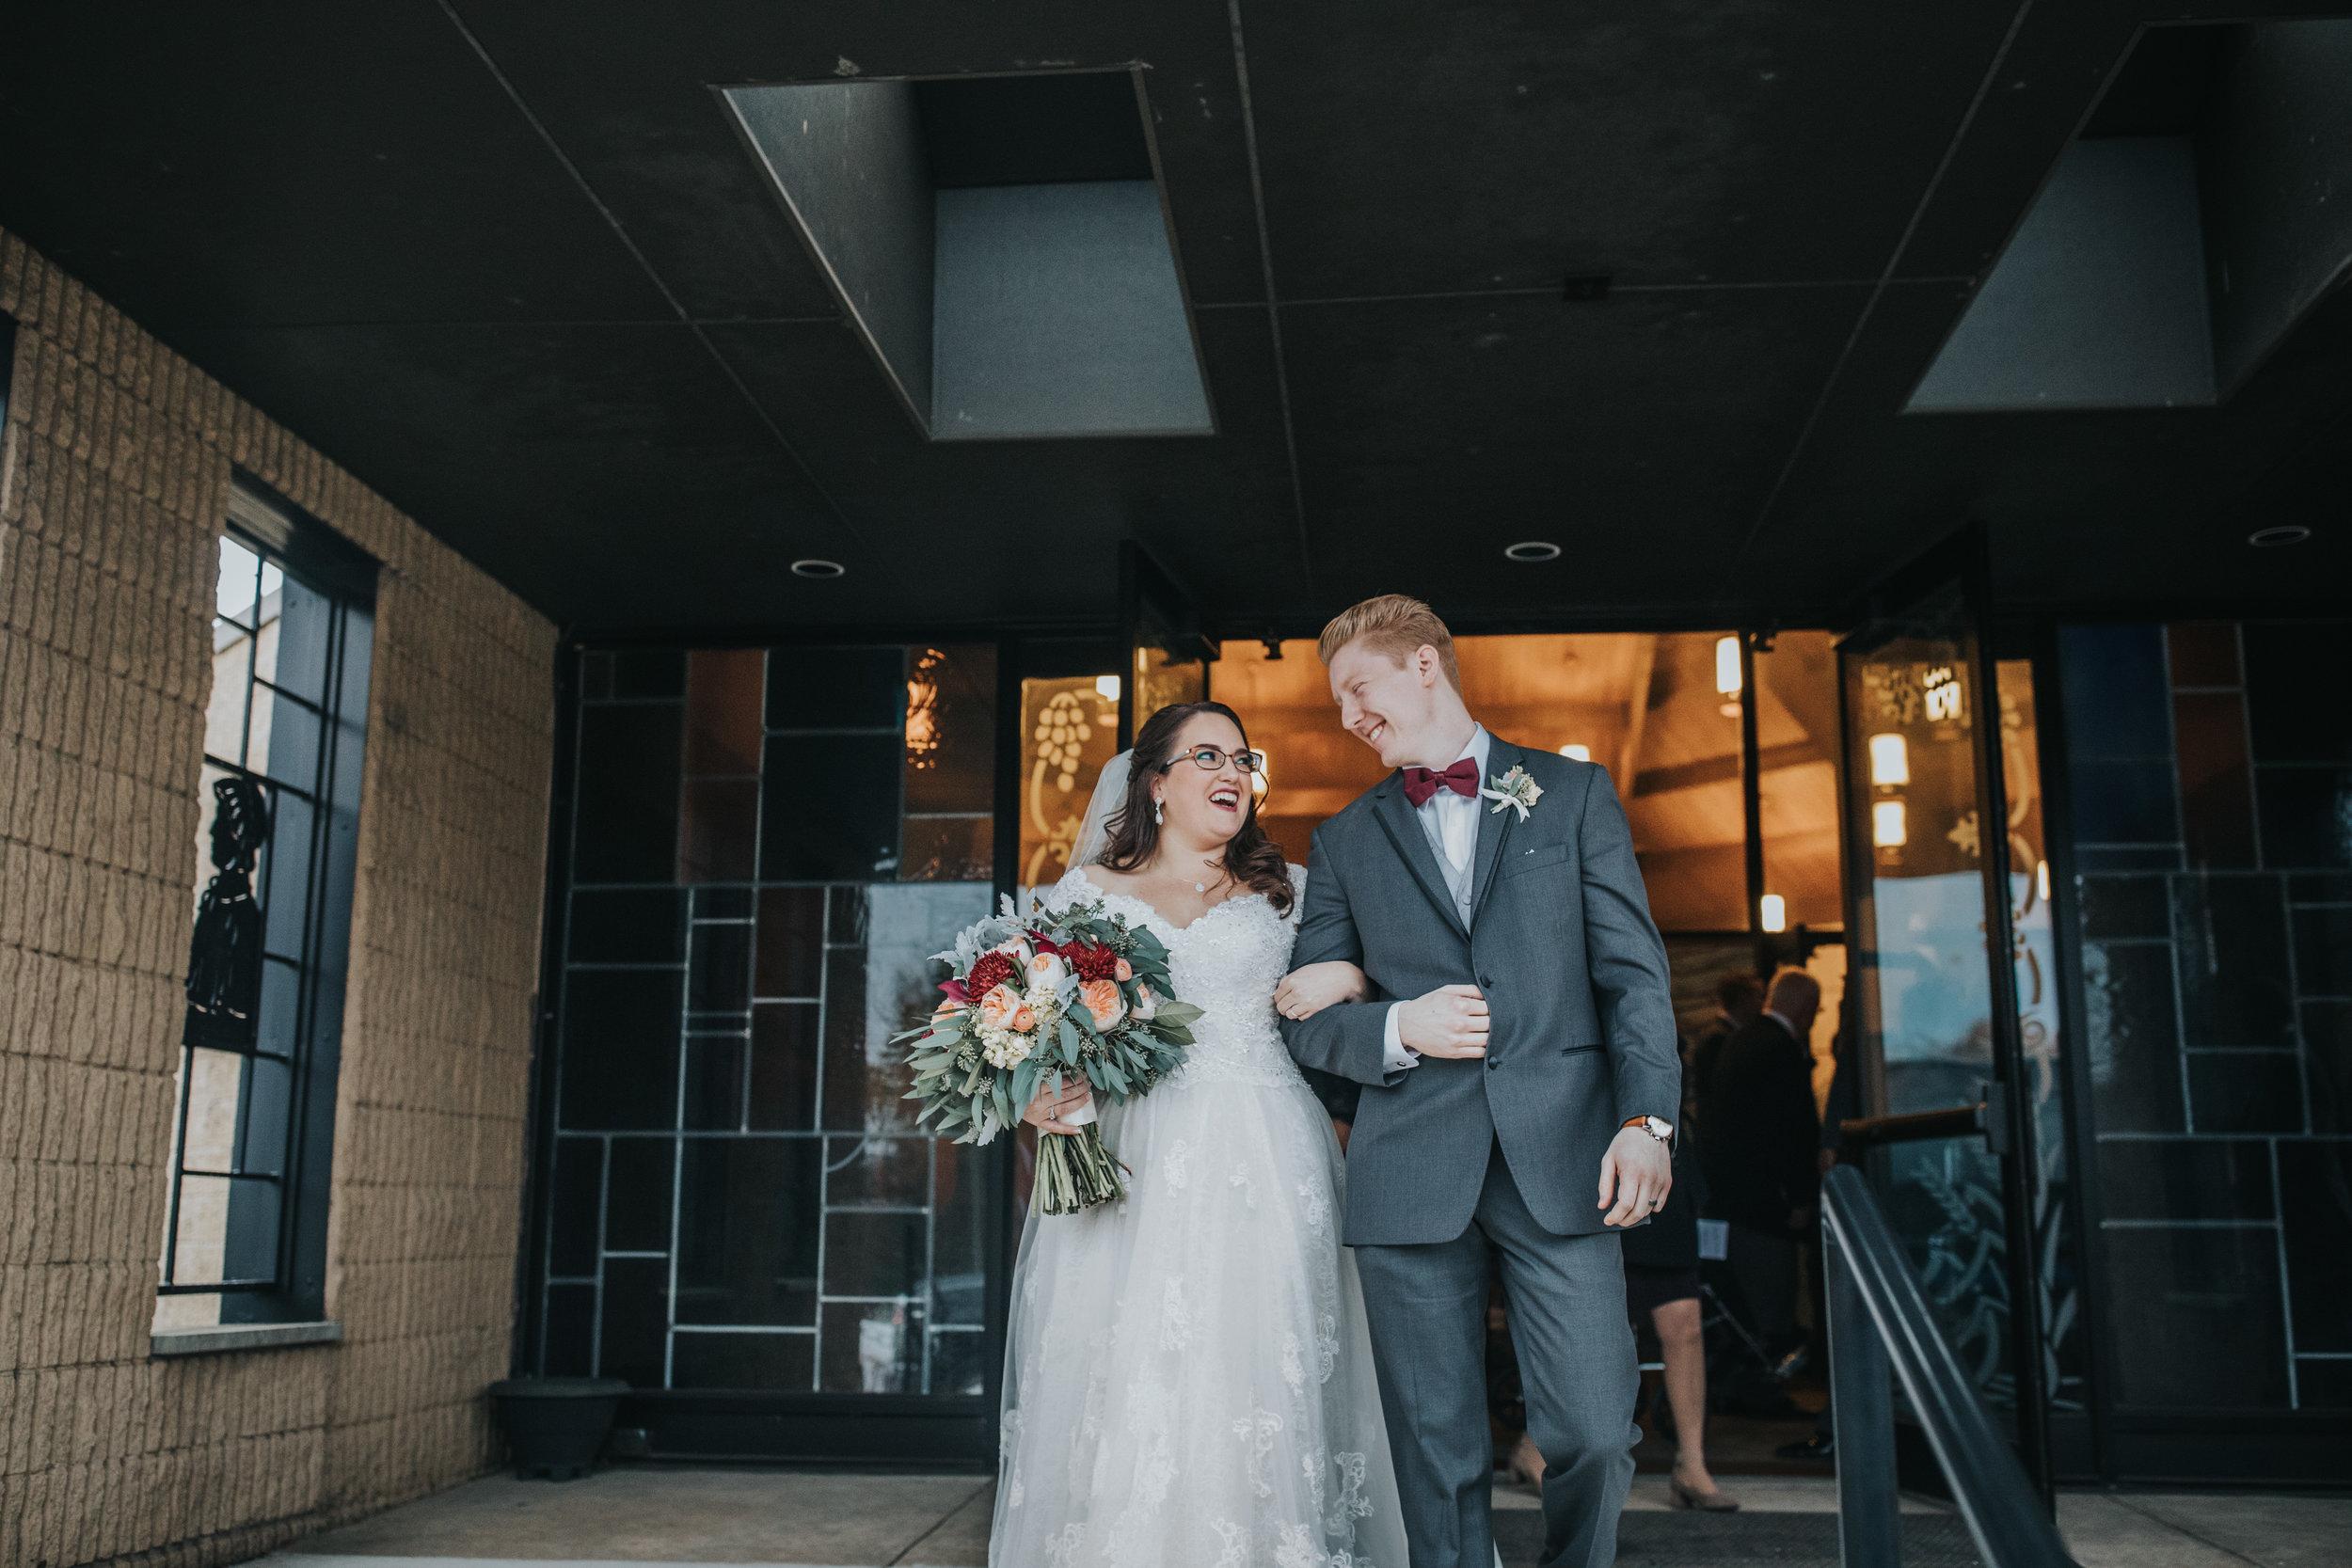 New-Jersey-Wedding-Photography-Fishers-Tudor-House-JennaLynnPhotography-Ceremony-Kathleen&Eddie-82.jpg